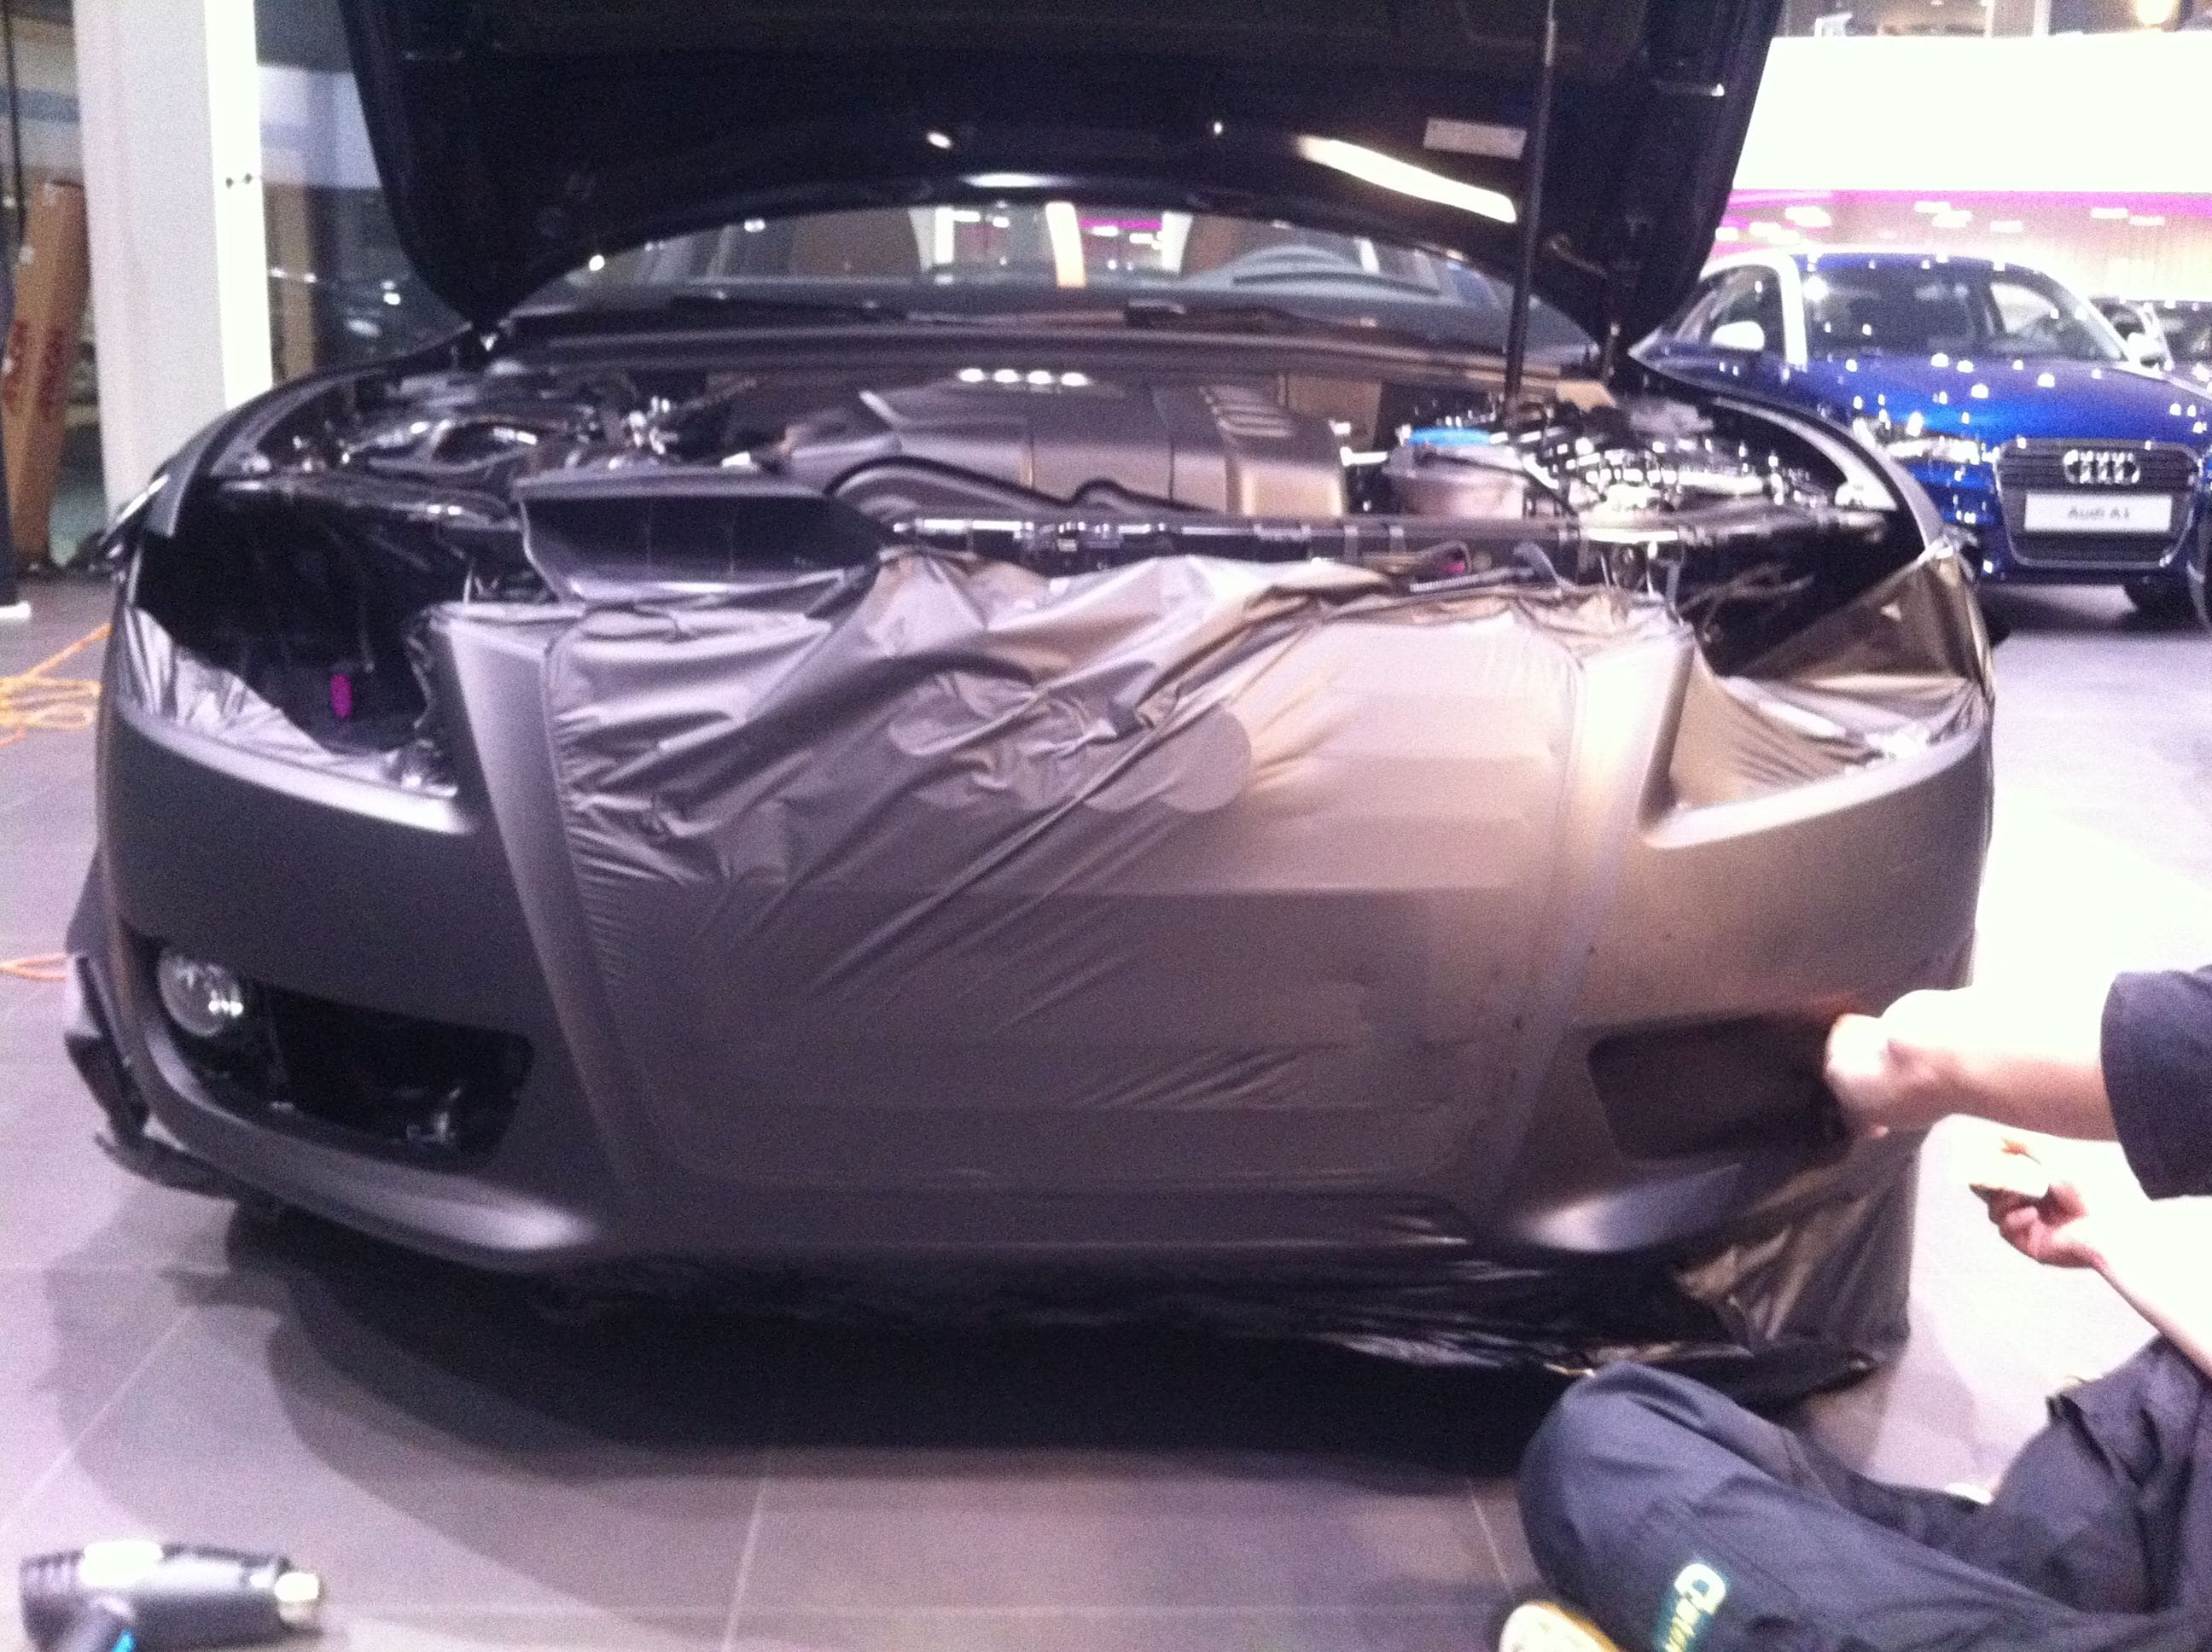 Audi A5 Sportback met Mat Grijze Wrap, Carwrapping door Wrapmyride.nu Foto-nr:4771, ©2021